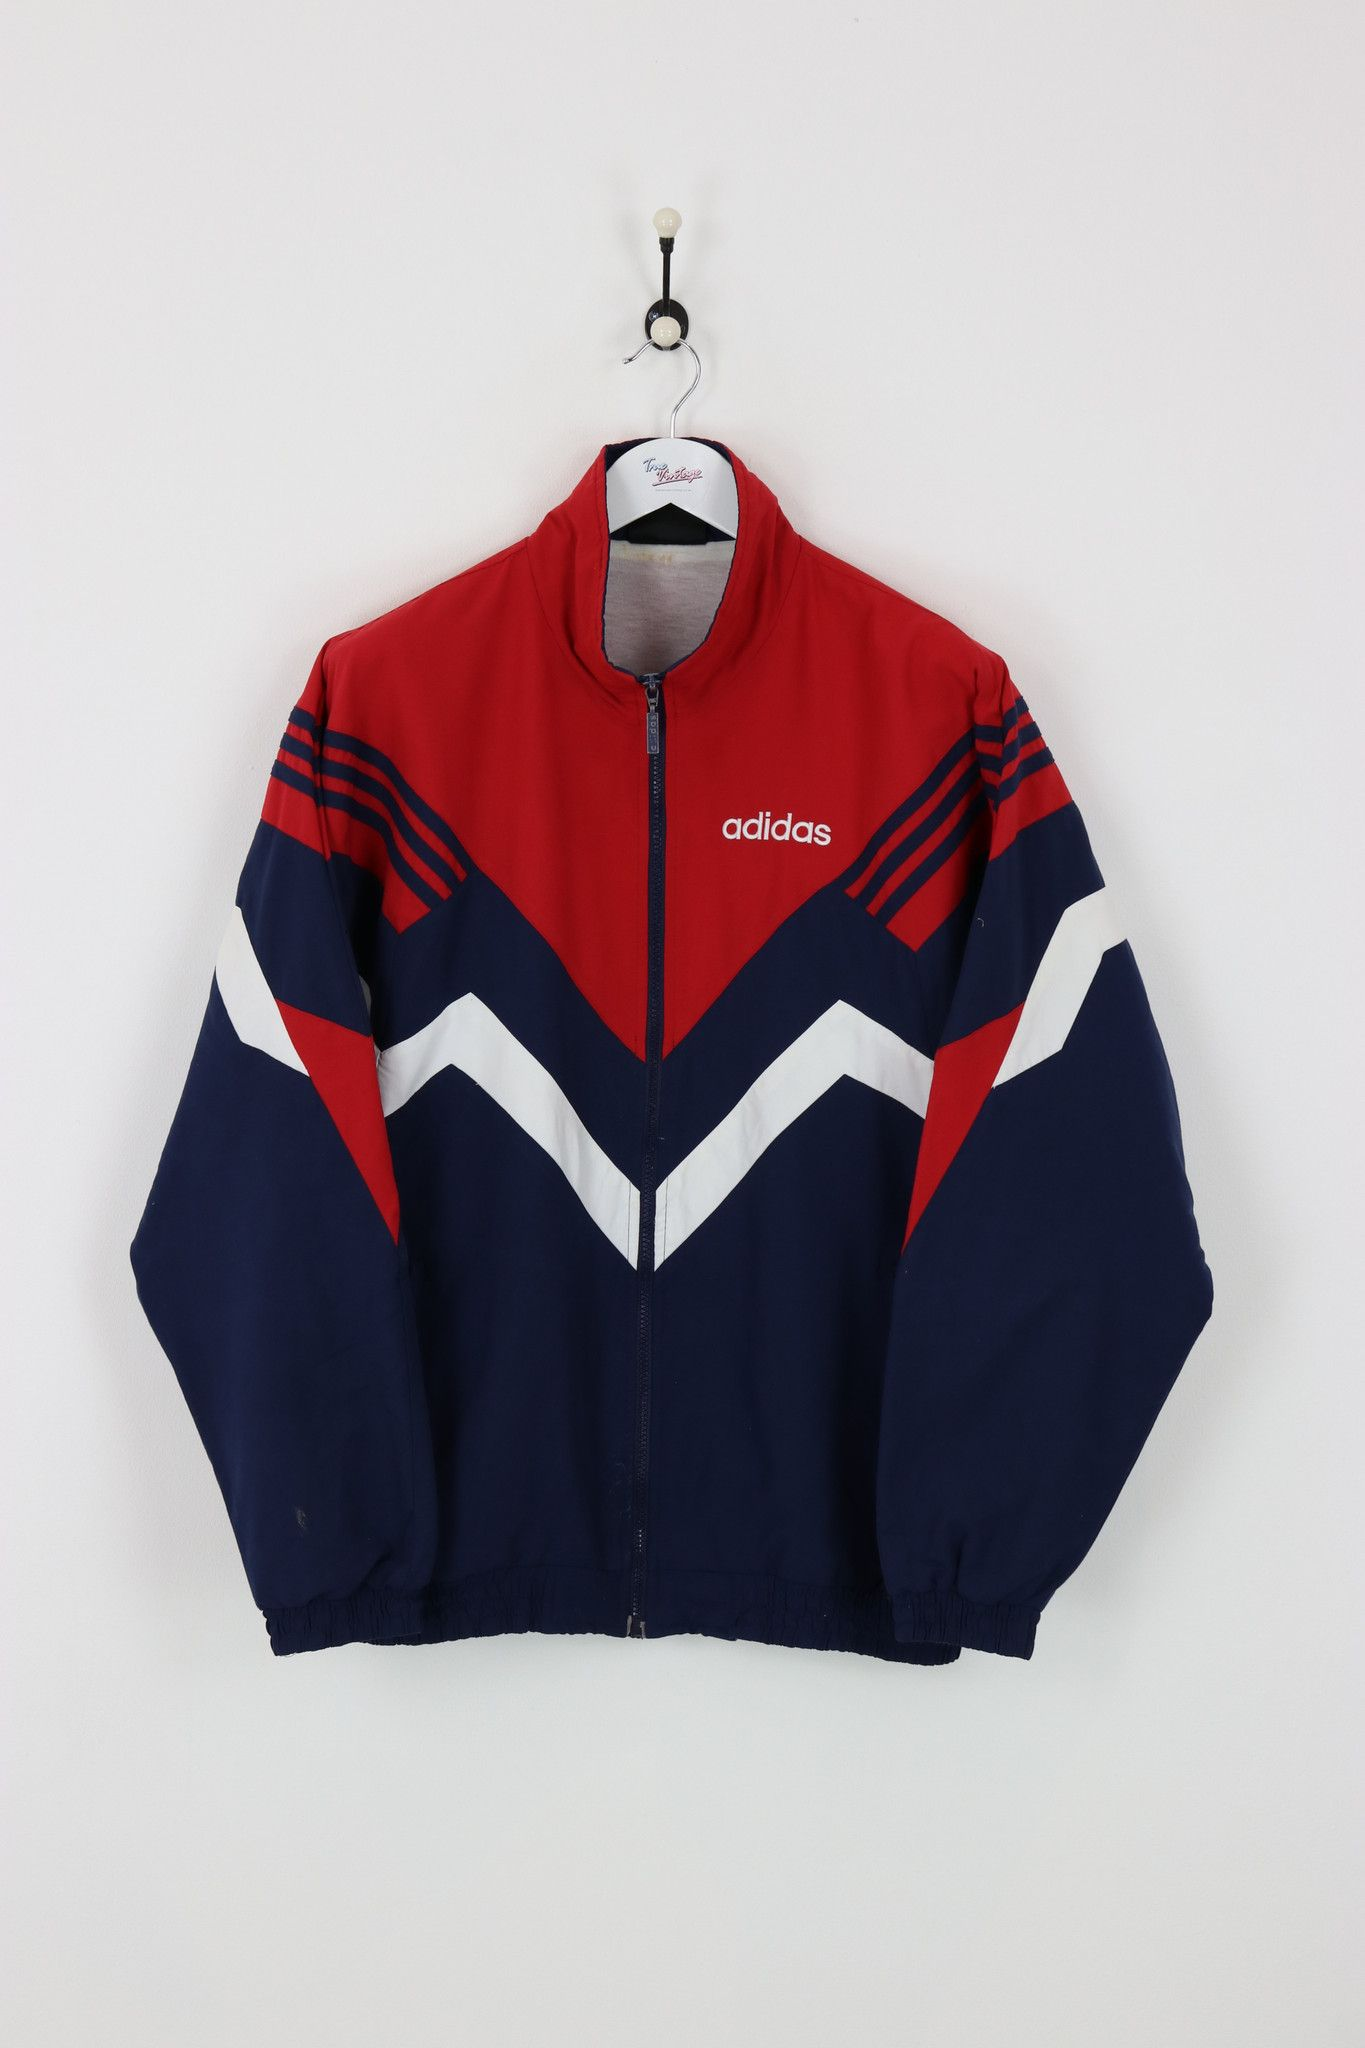 Very Suit JacketMeasurements Adidas Shell ConditionVintage Good JKTF5ul13c